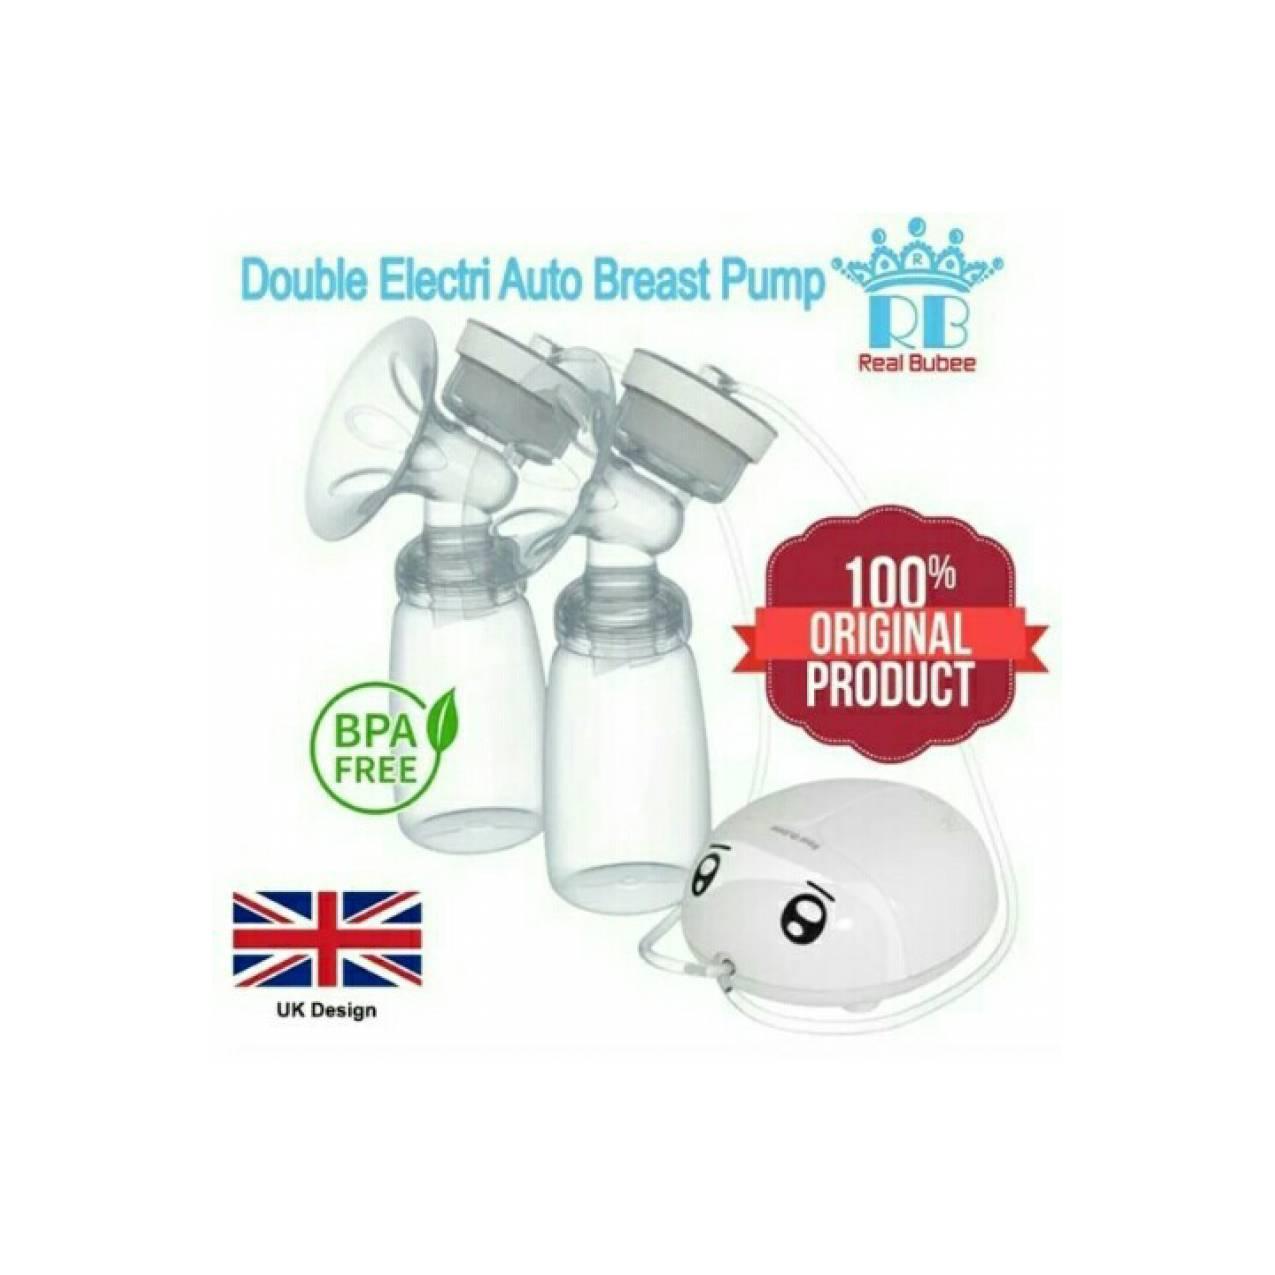 breastpump elektrik electric ASI real bubee lembut aman nyaman BPAFREE